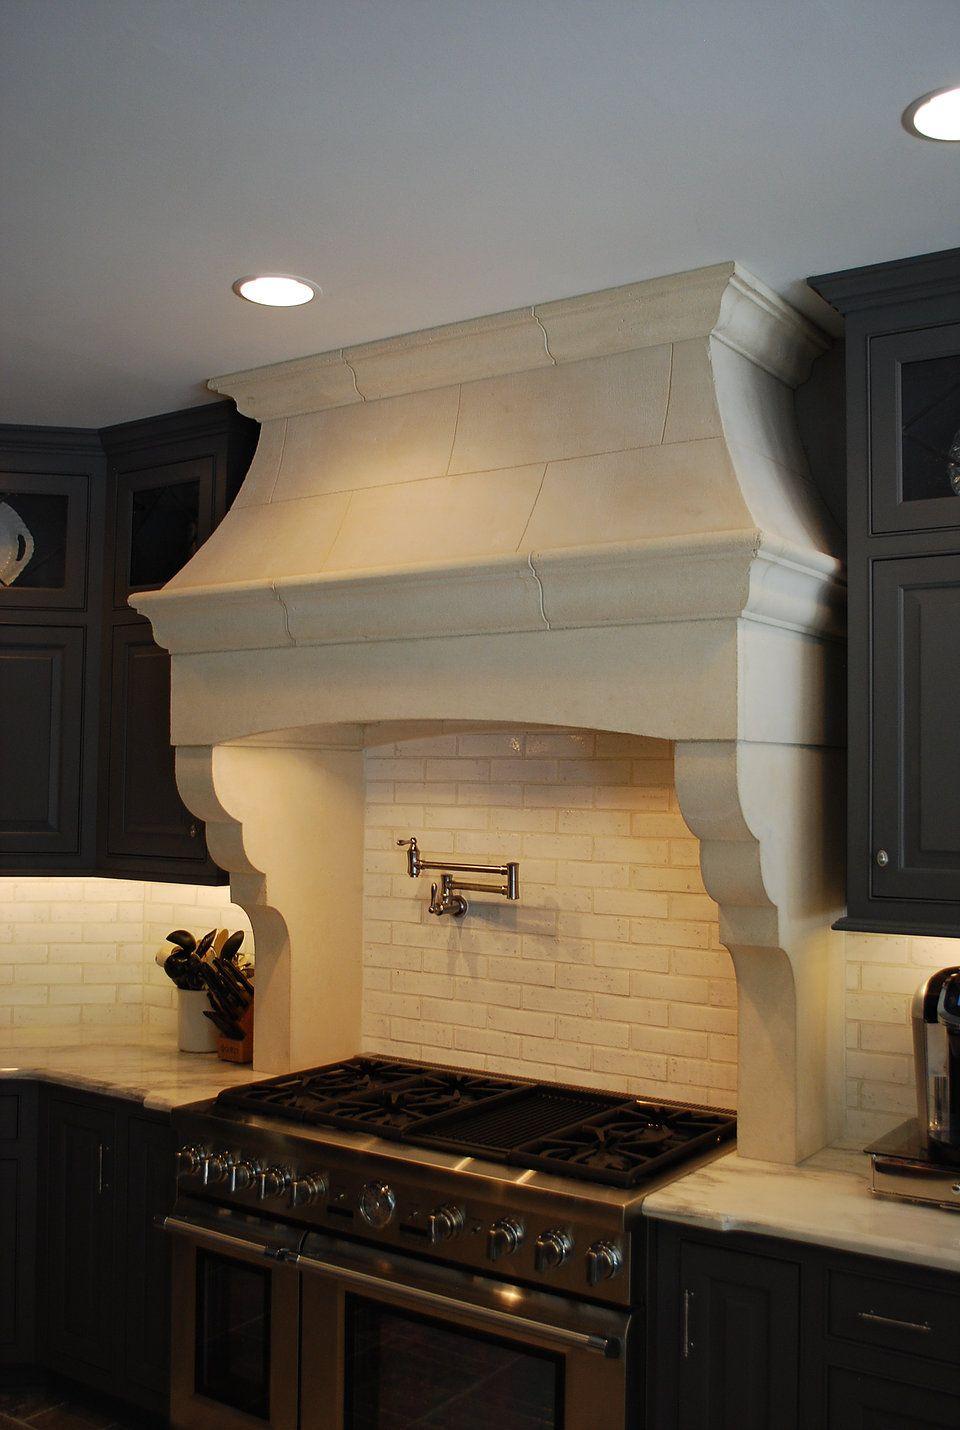 Best Kitchen Gallery: Cast Stone Hoods And Limestone Fireplace Custom Products Stone of Stone Kitchen Hoods on rachelxblog.com